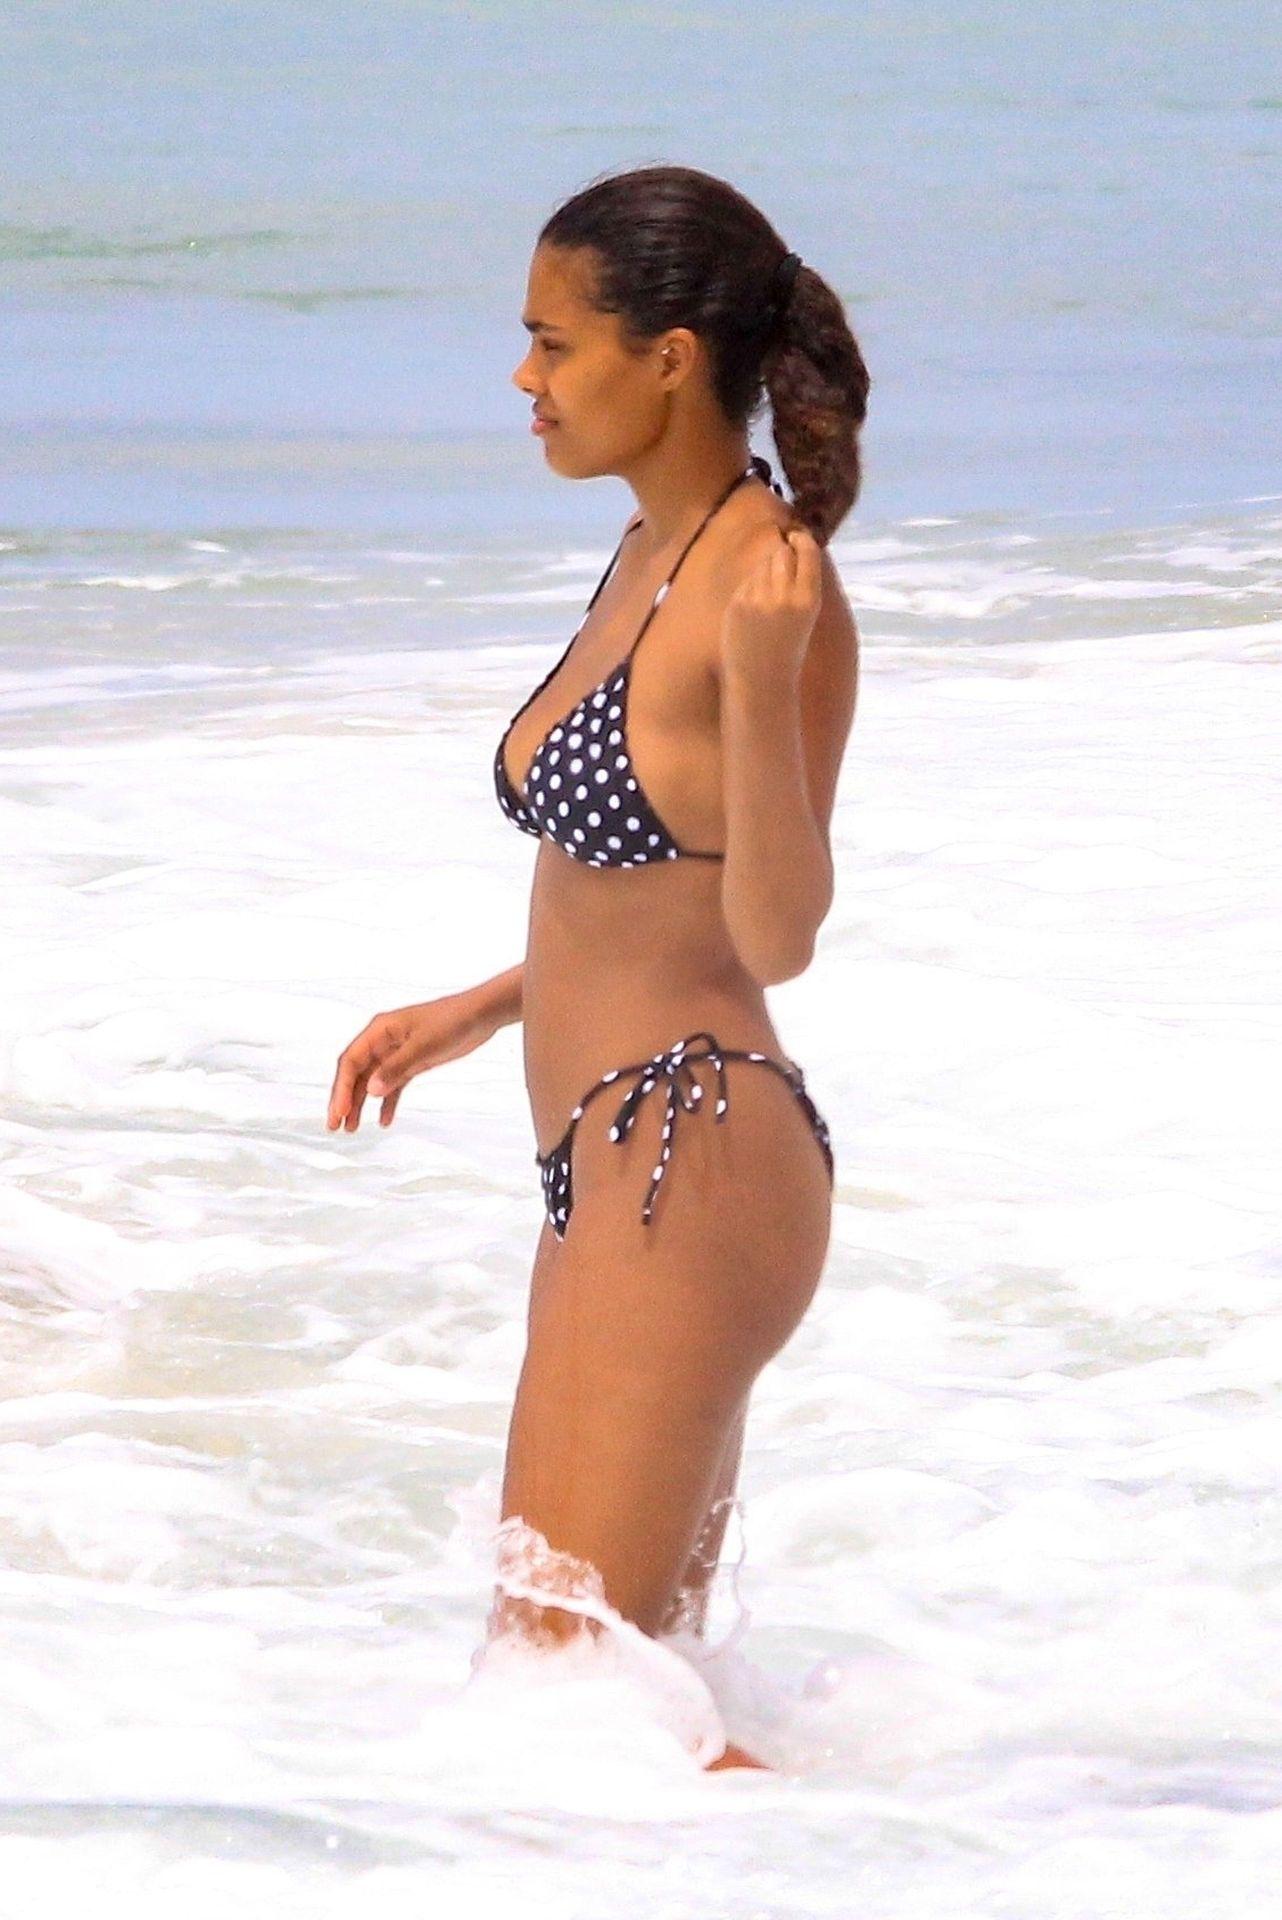 Tina Kunakey Nearly Nip Slip While Frolicking On The Beach In Rio 0045